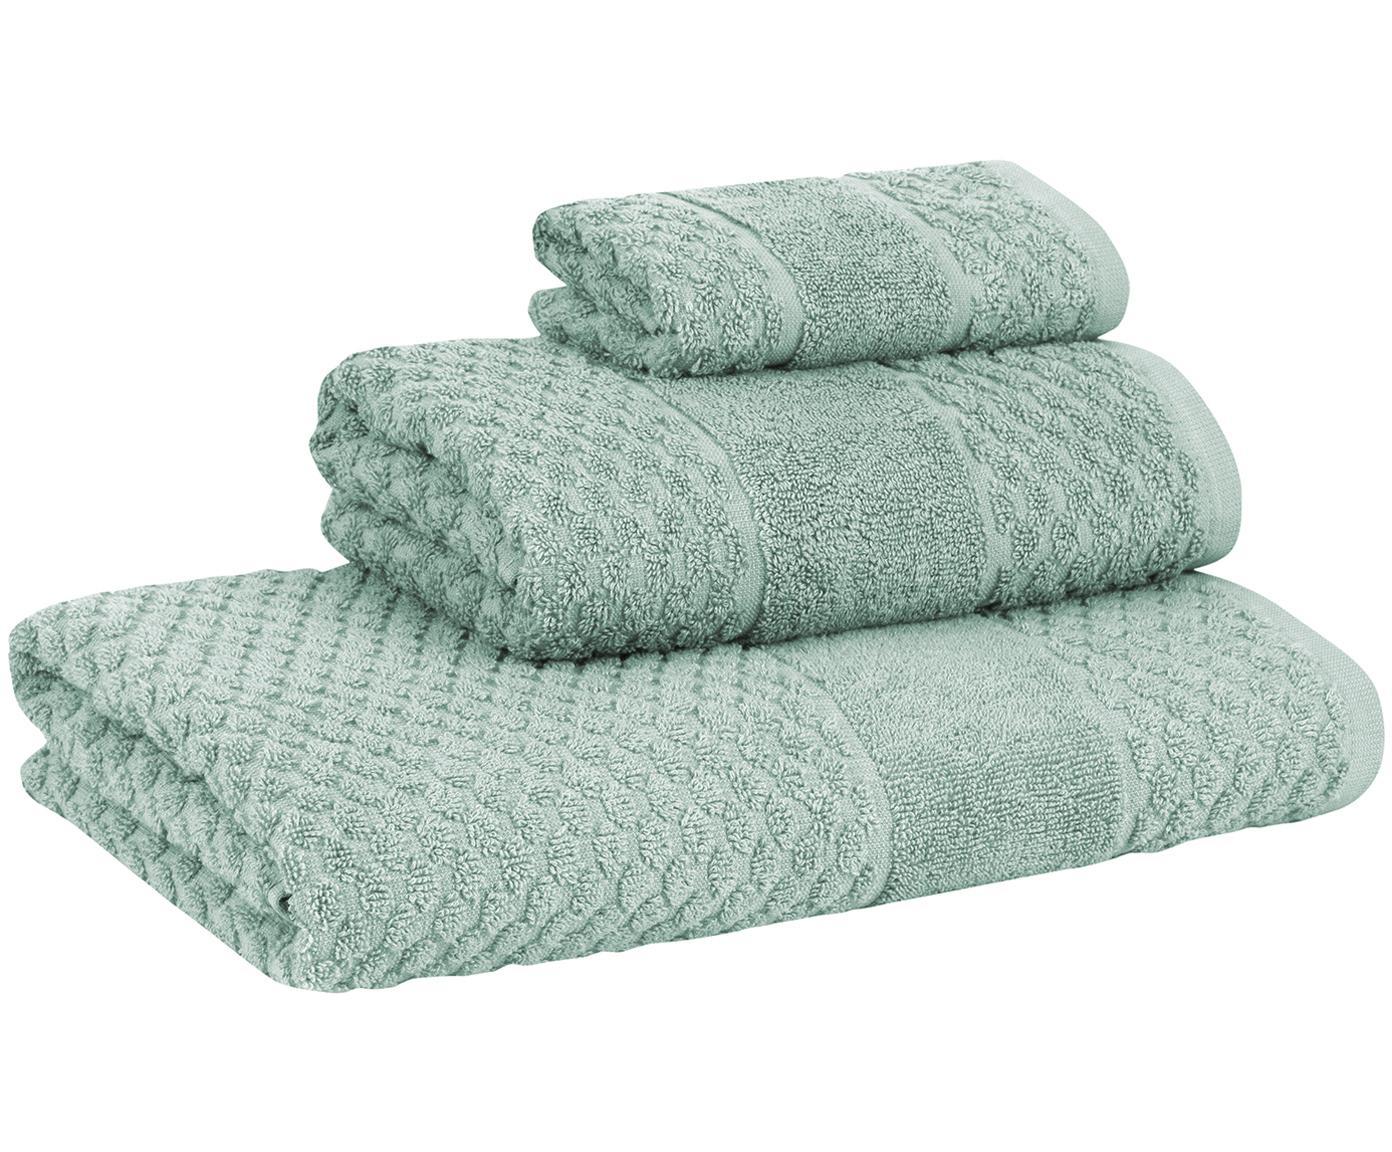 Set 3 asciugamani con motivo a nido d'ape Katharina, Menta, Diverse dimensioni